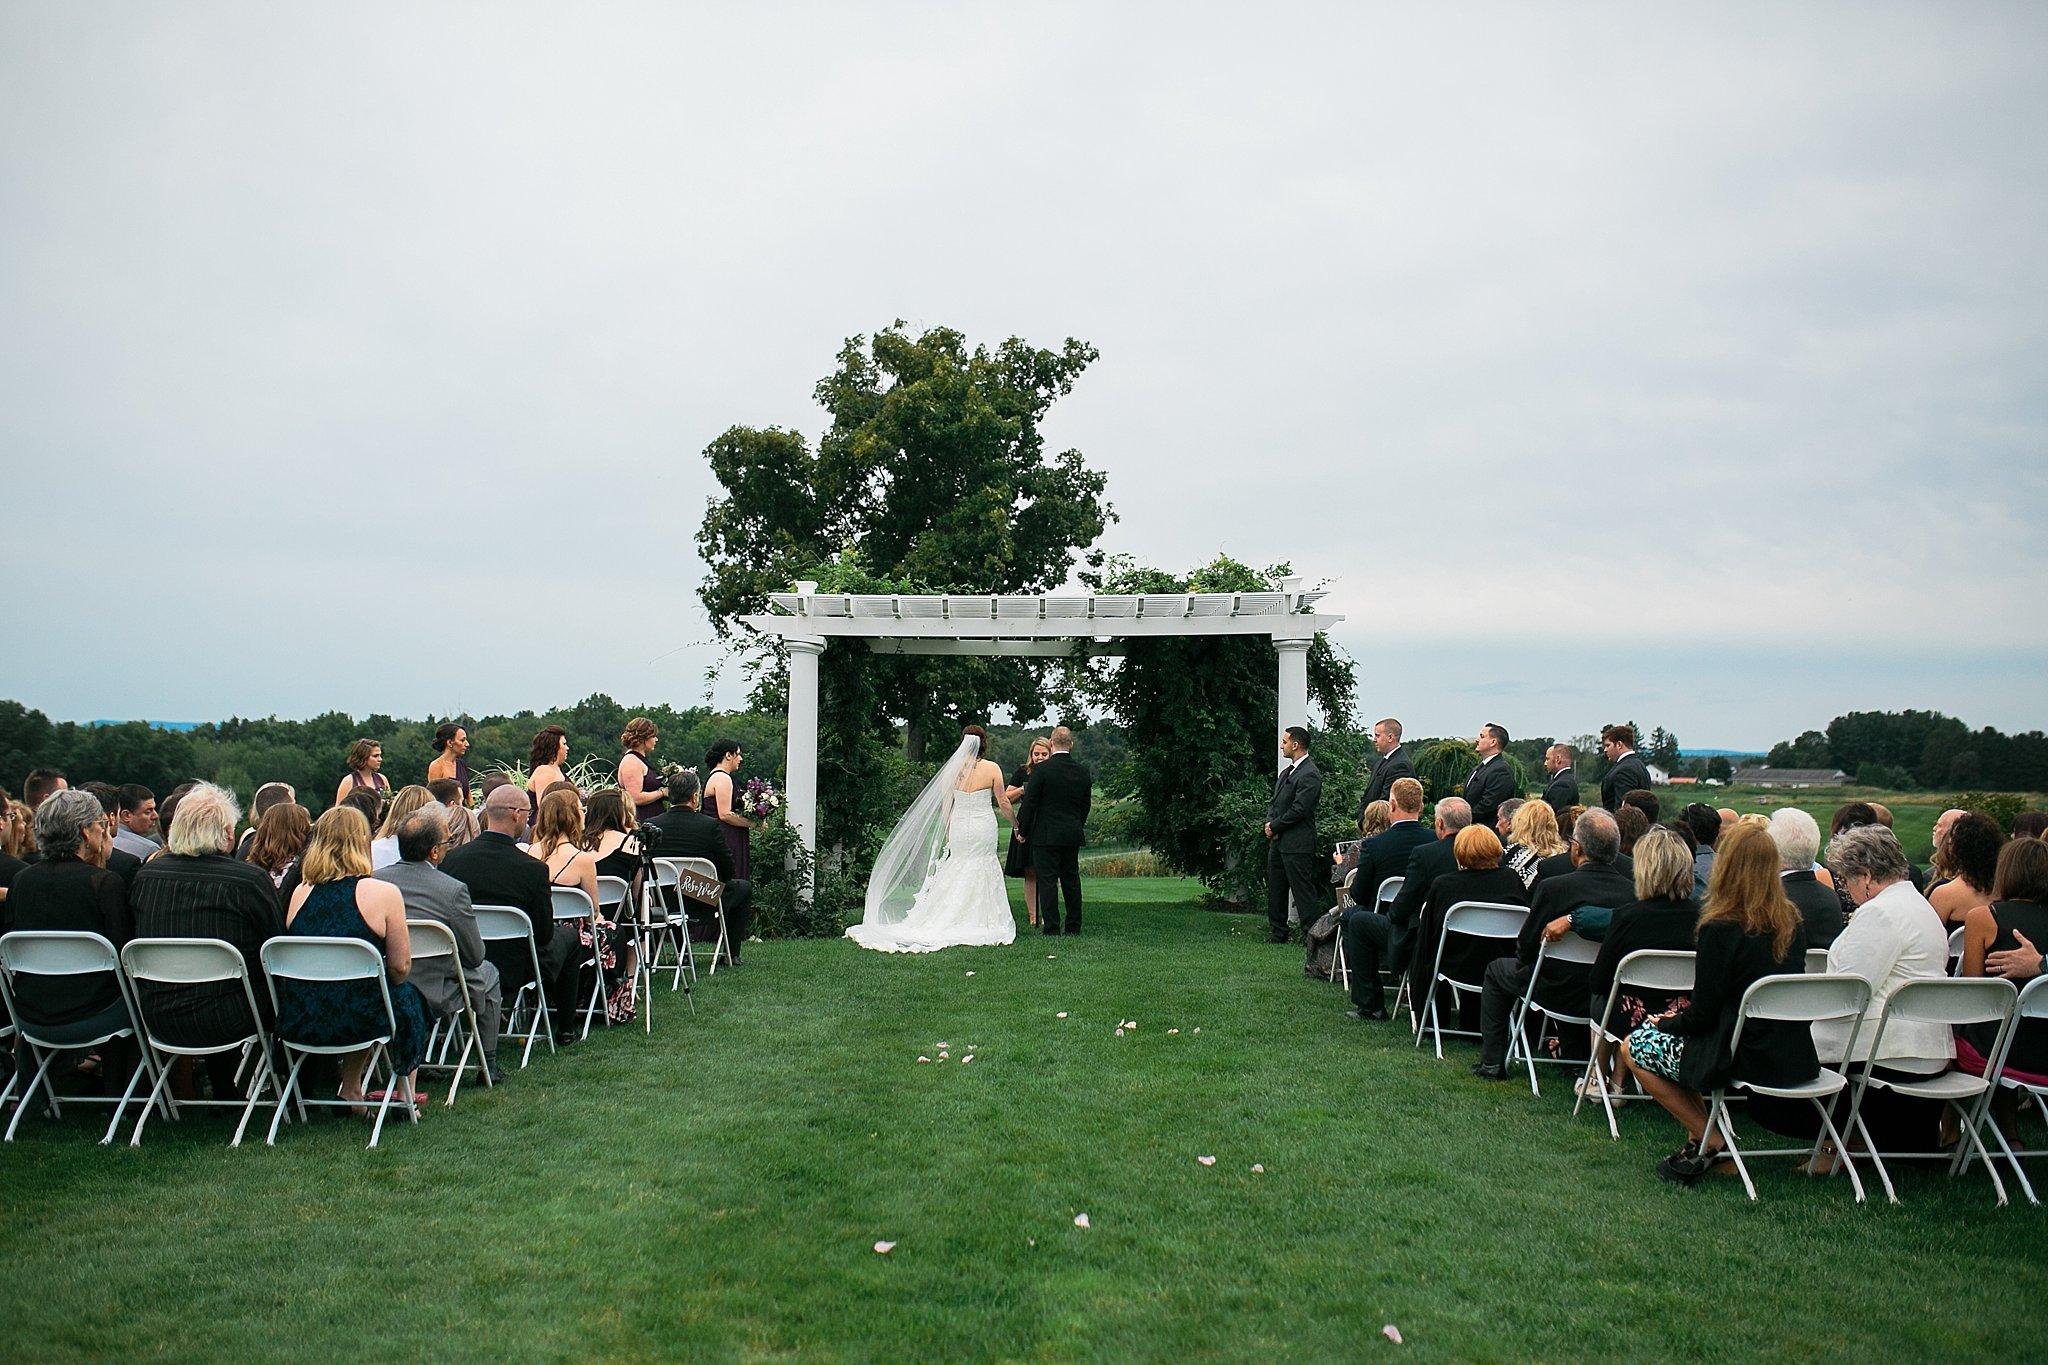 Links at Unionvale Wedding Lagrangeville Wedding Hudson Valley Wedding Photographer Sweet Alice Photography30.jpg